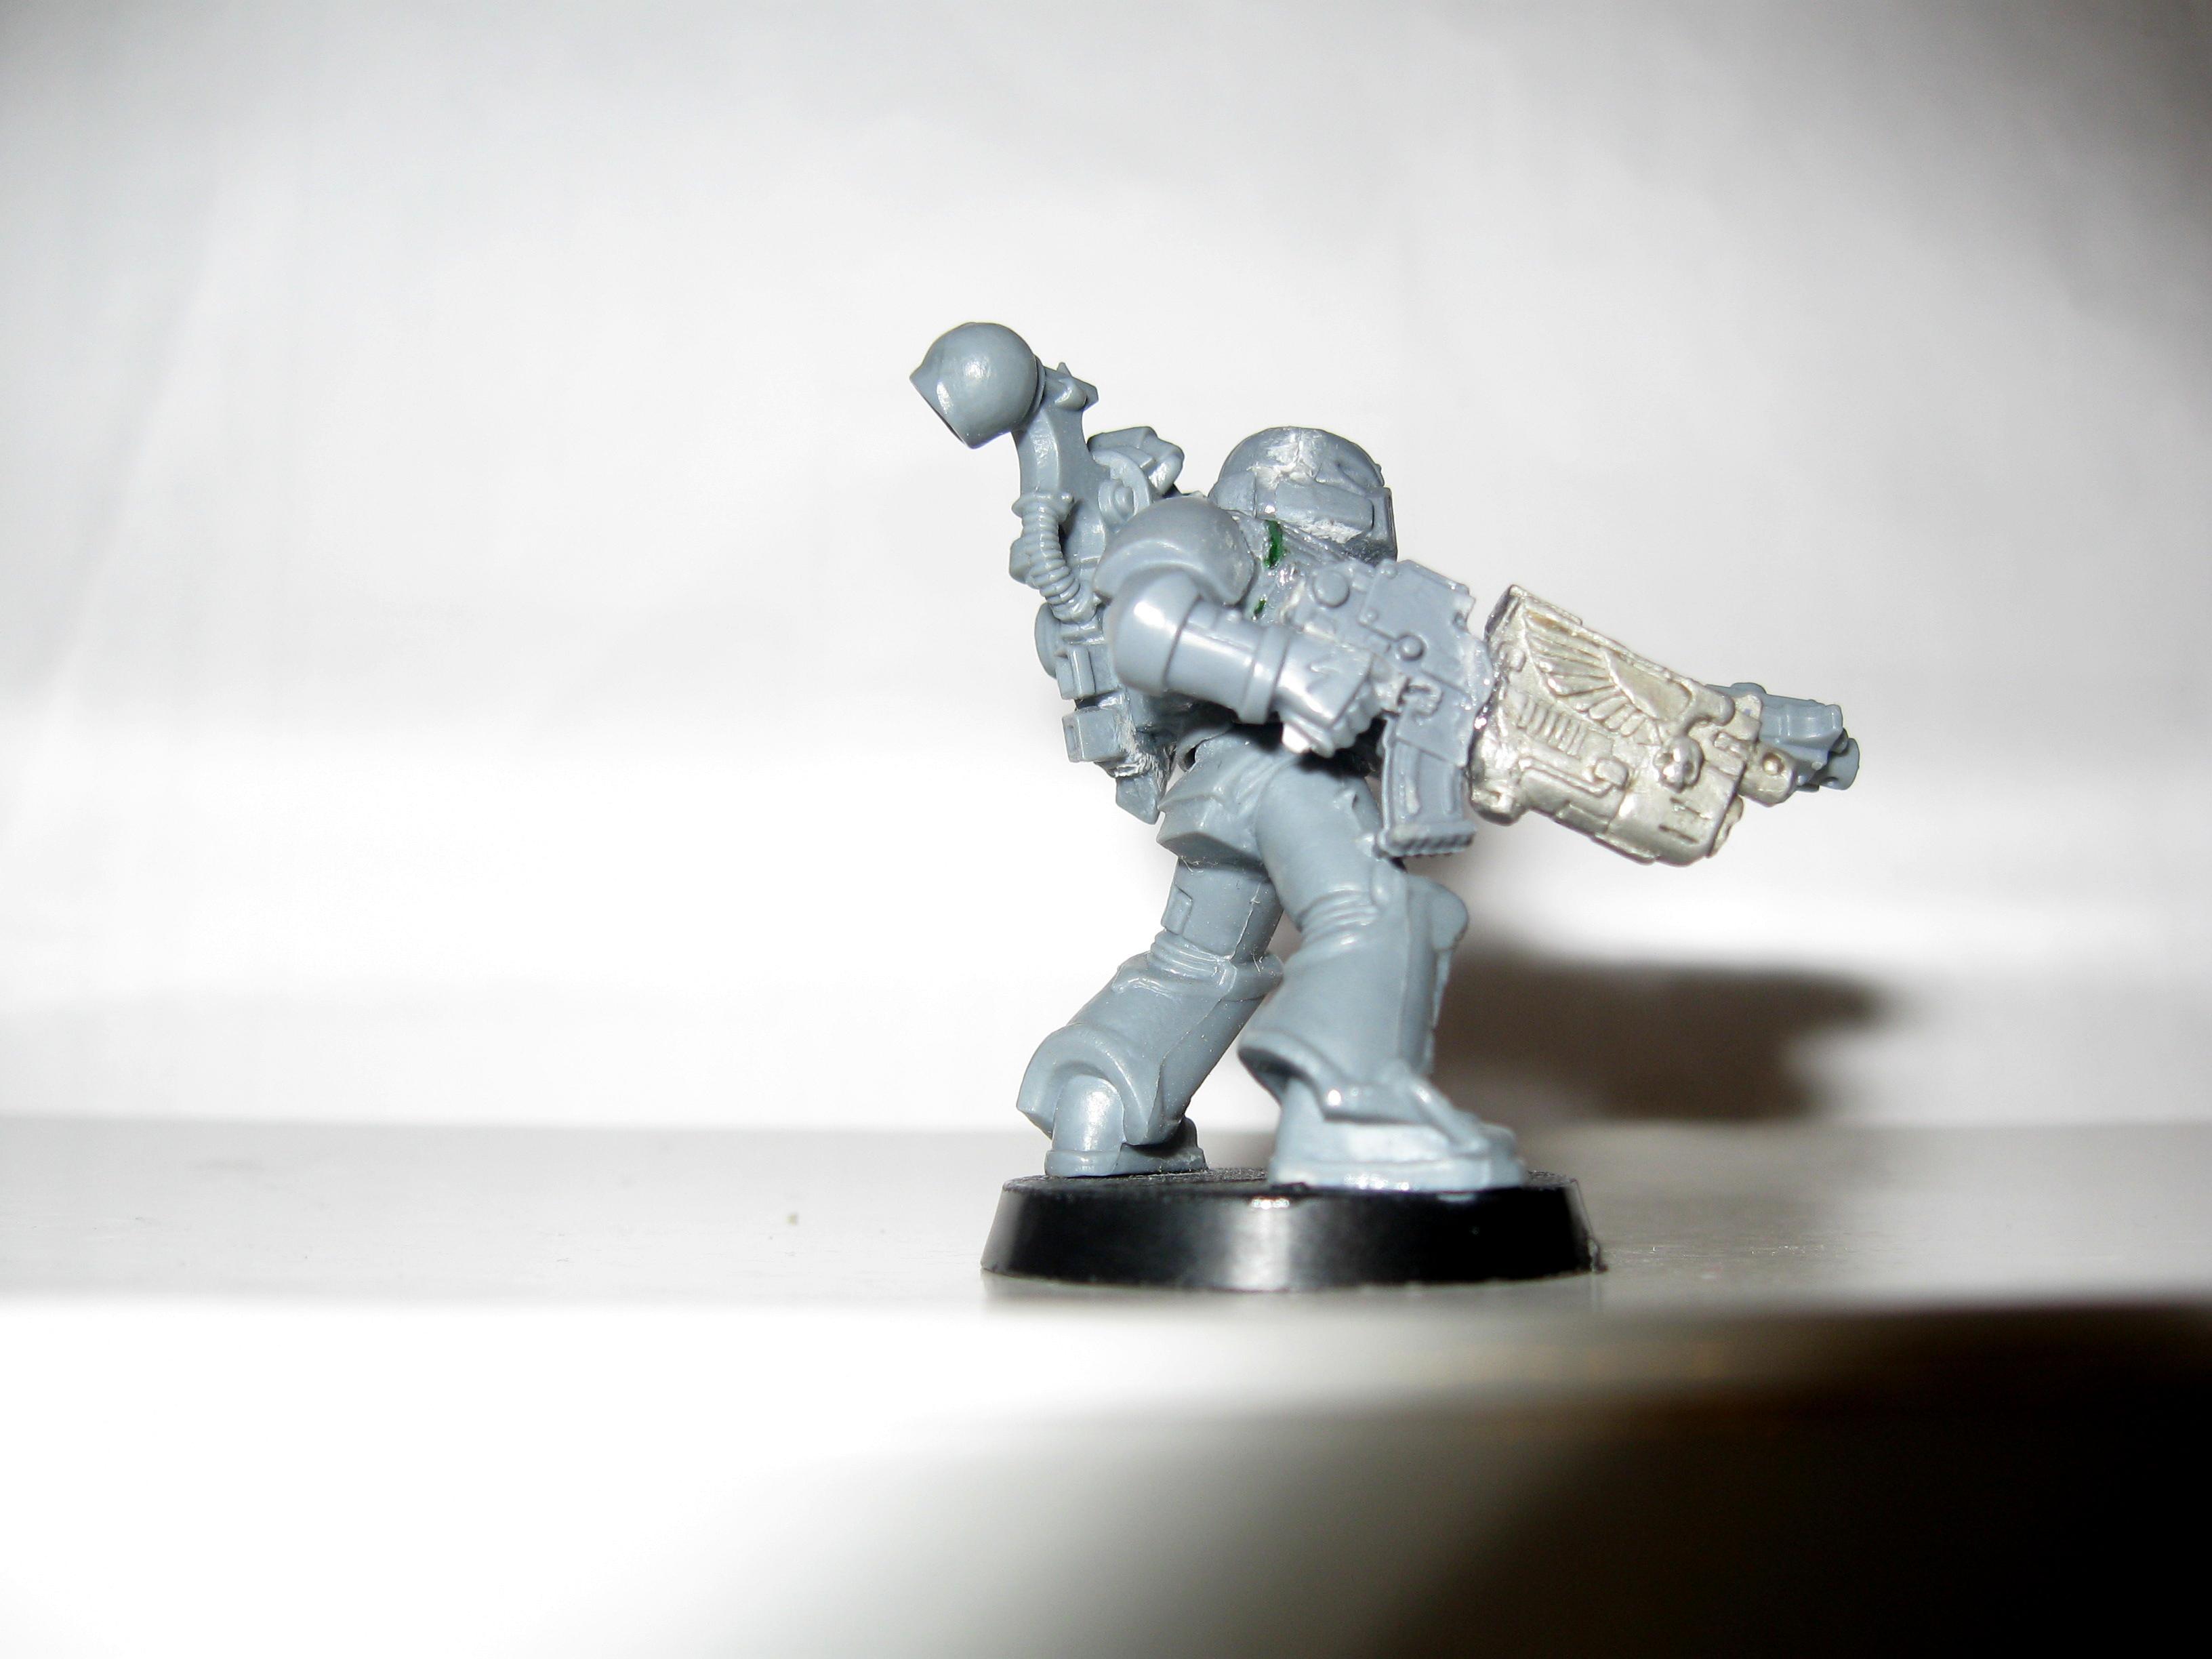 Stern Guard Bad Broken weapon!